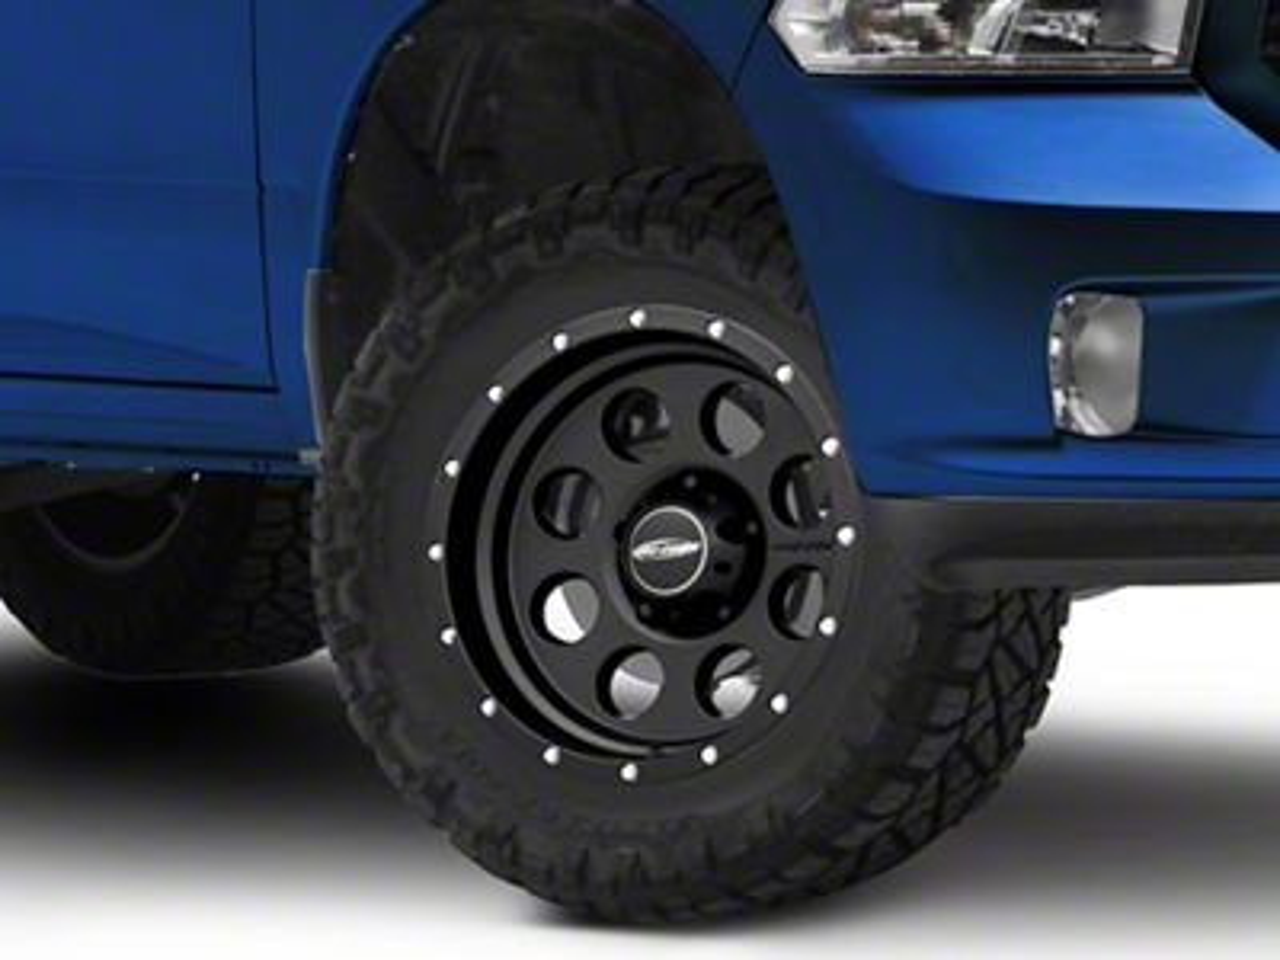 Pro Comp Proxy Satin Black 5-Lug Wheel - 17x9 (02-18 RAM 1500, Excluding Mega Cab)